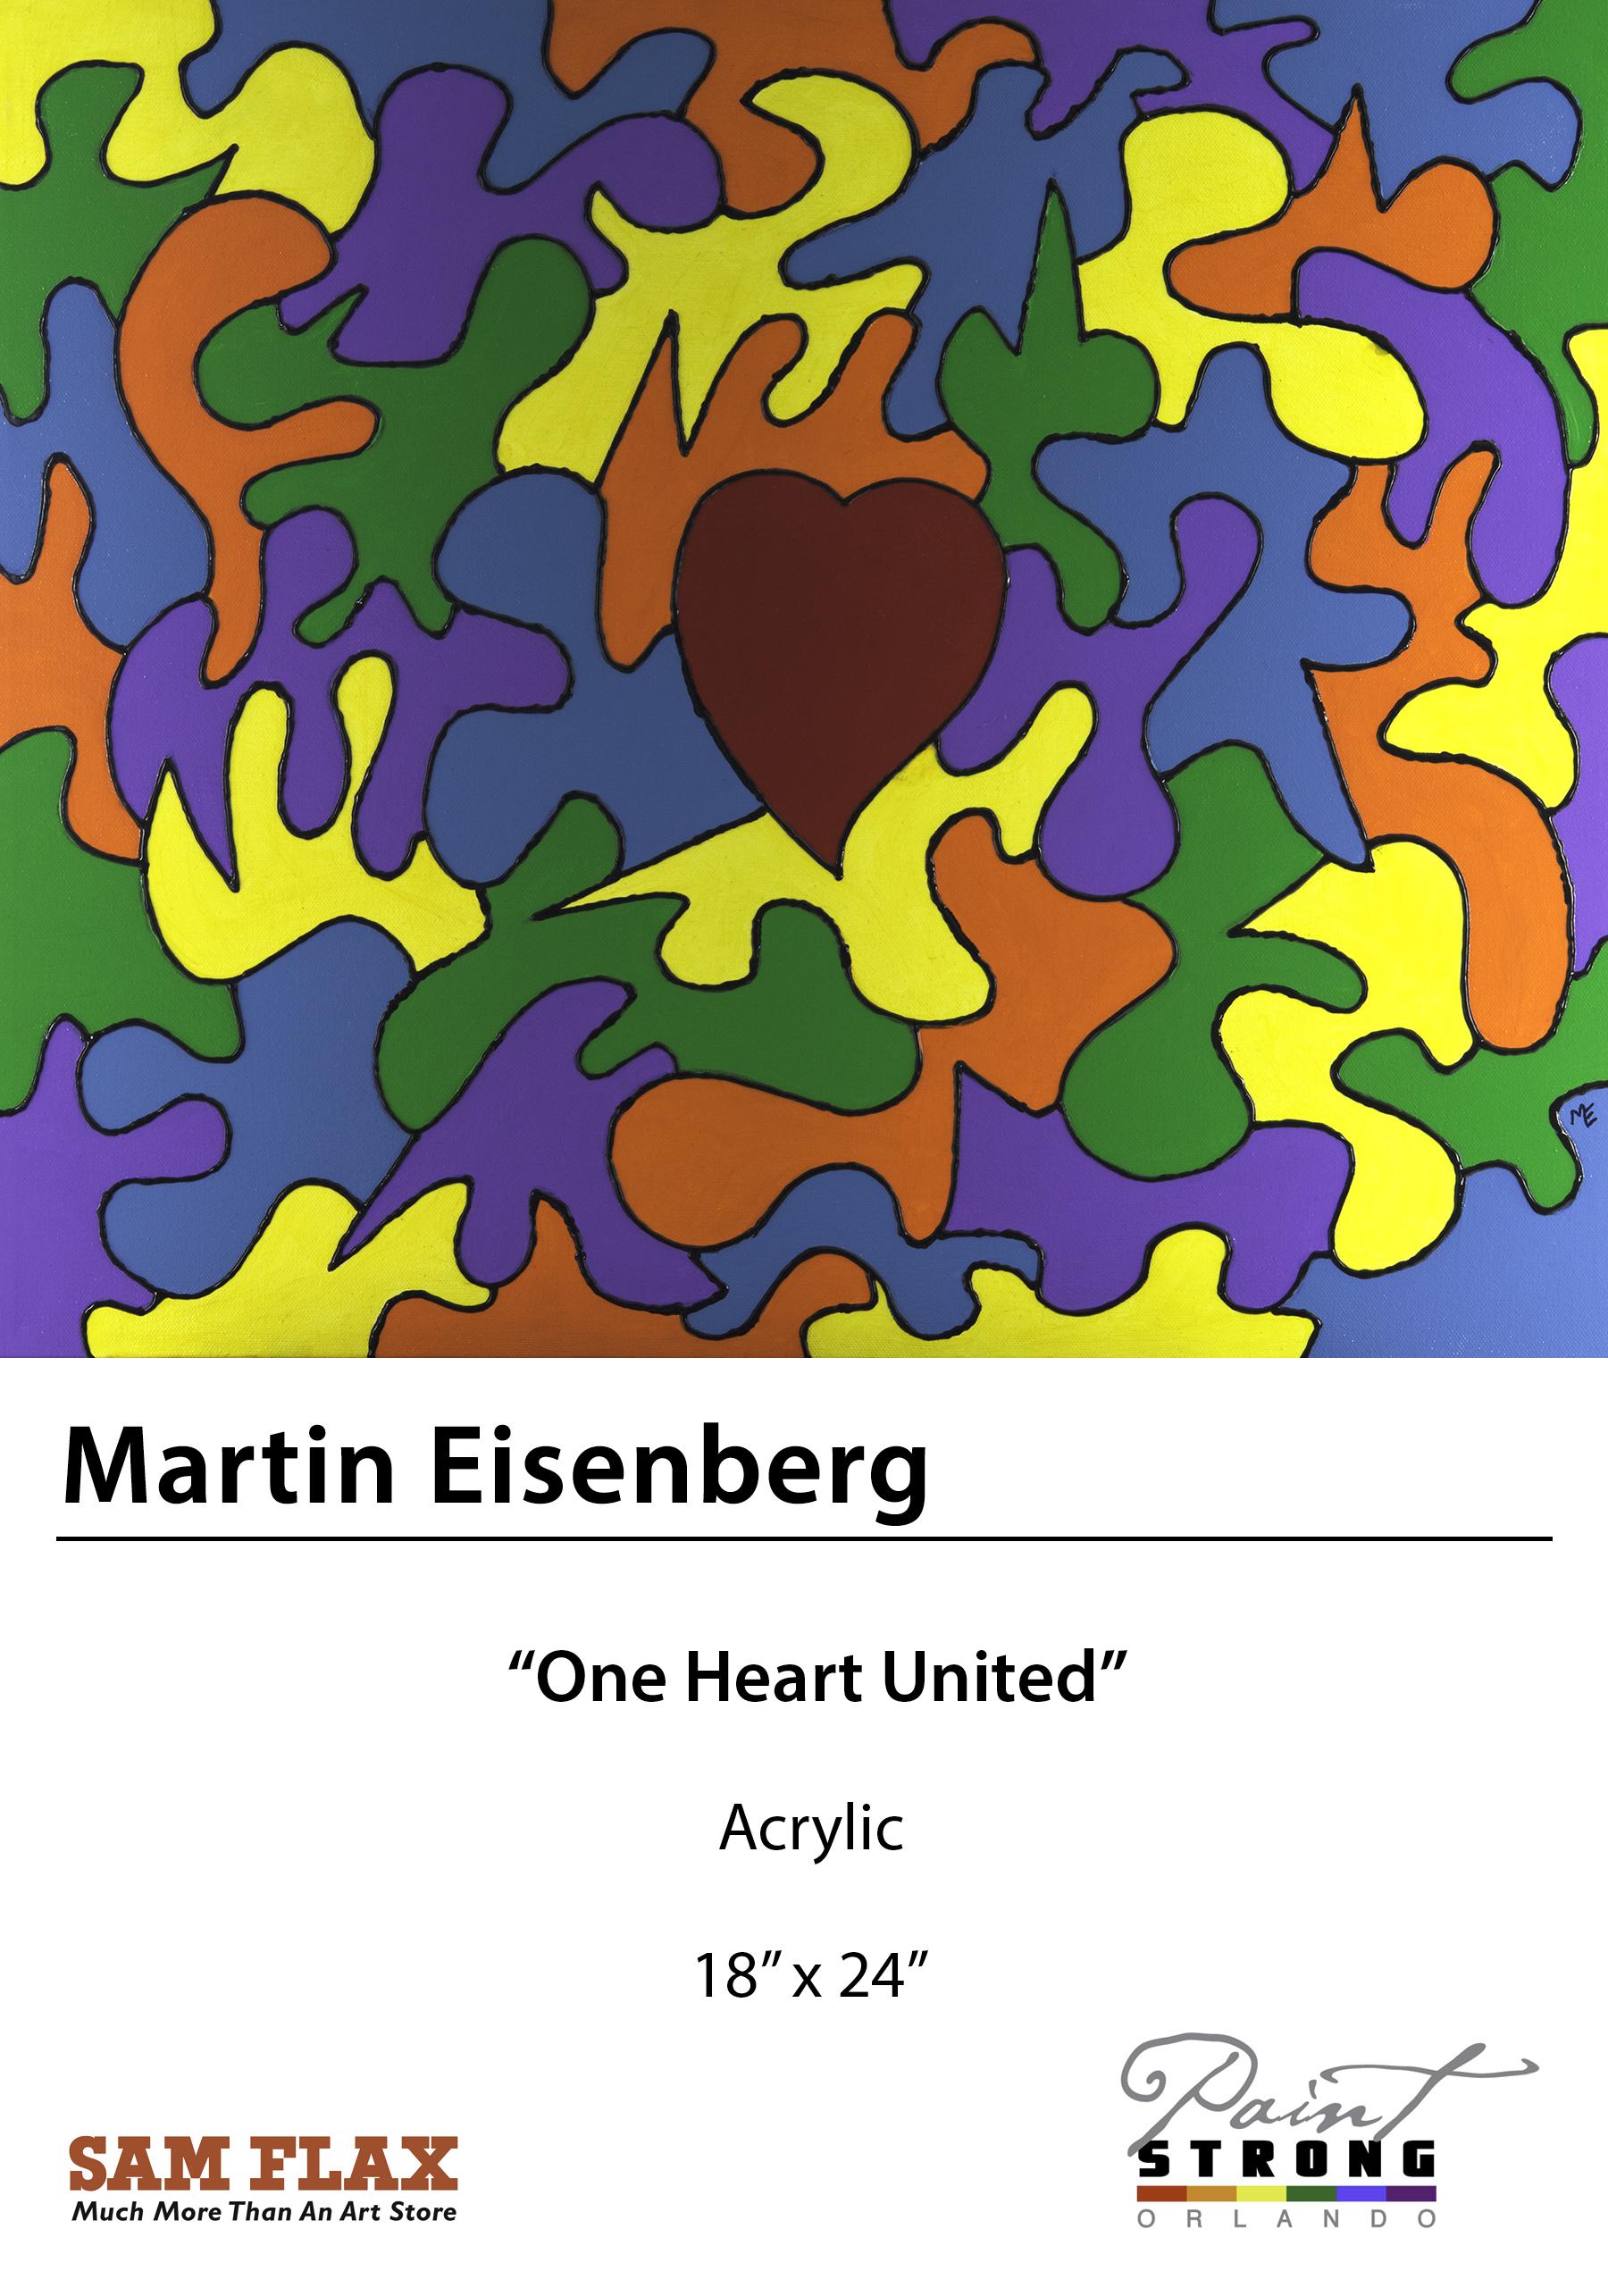 Martin Eisenberg